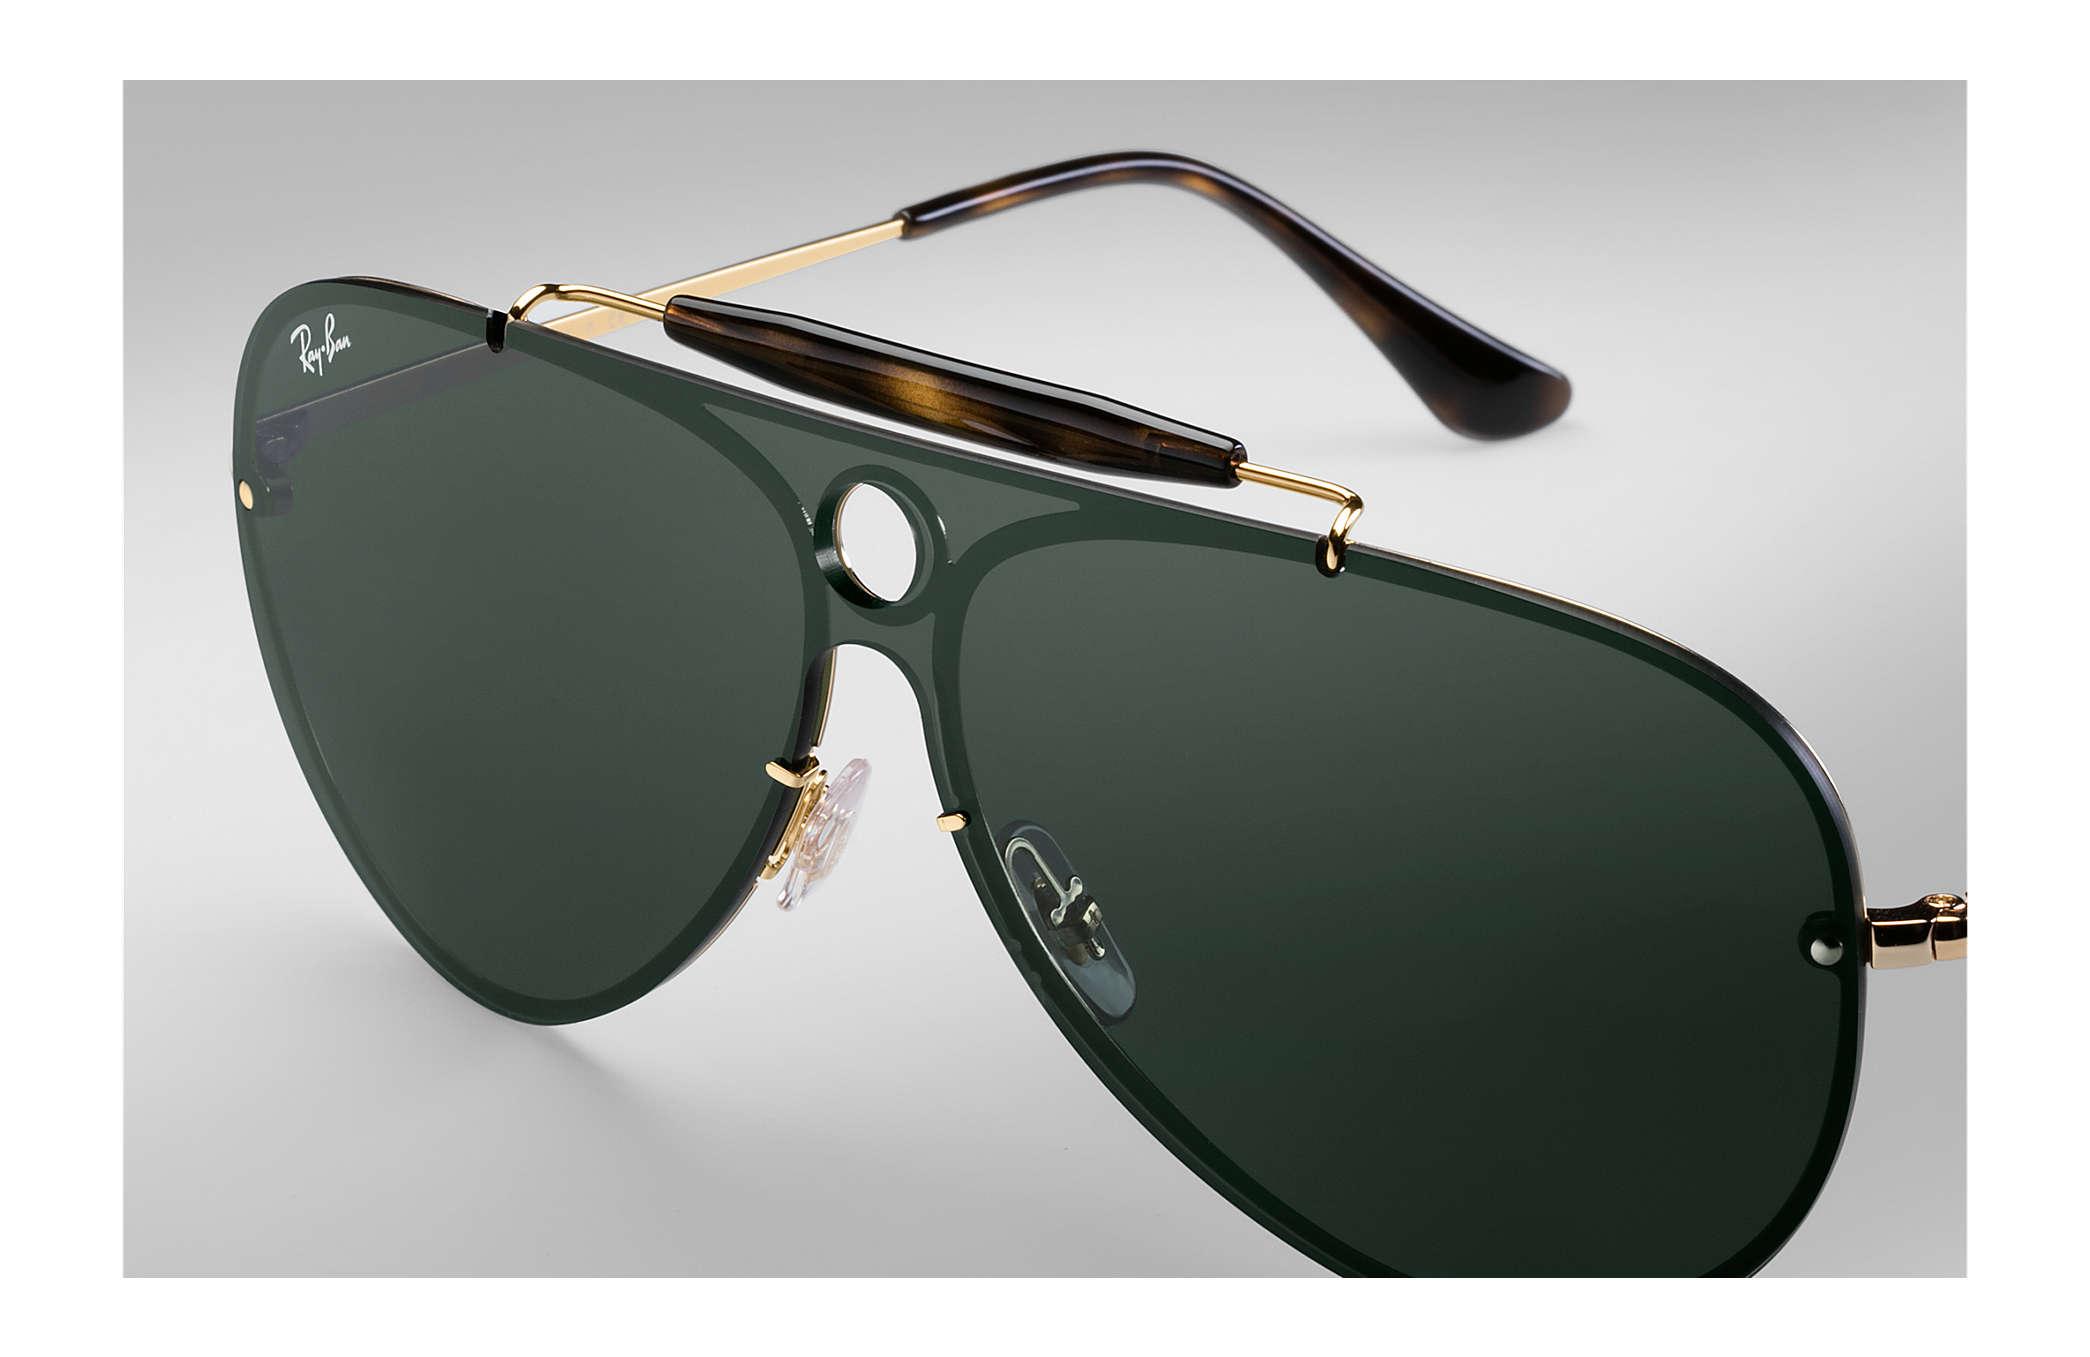 Ray ban sunglasses with price - Ray Ban 0rb3581n Blaze Shooter Gold Sun